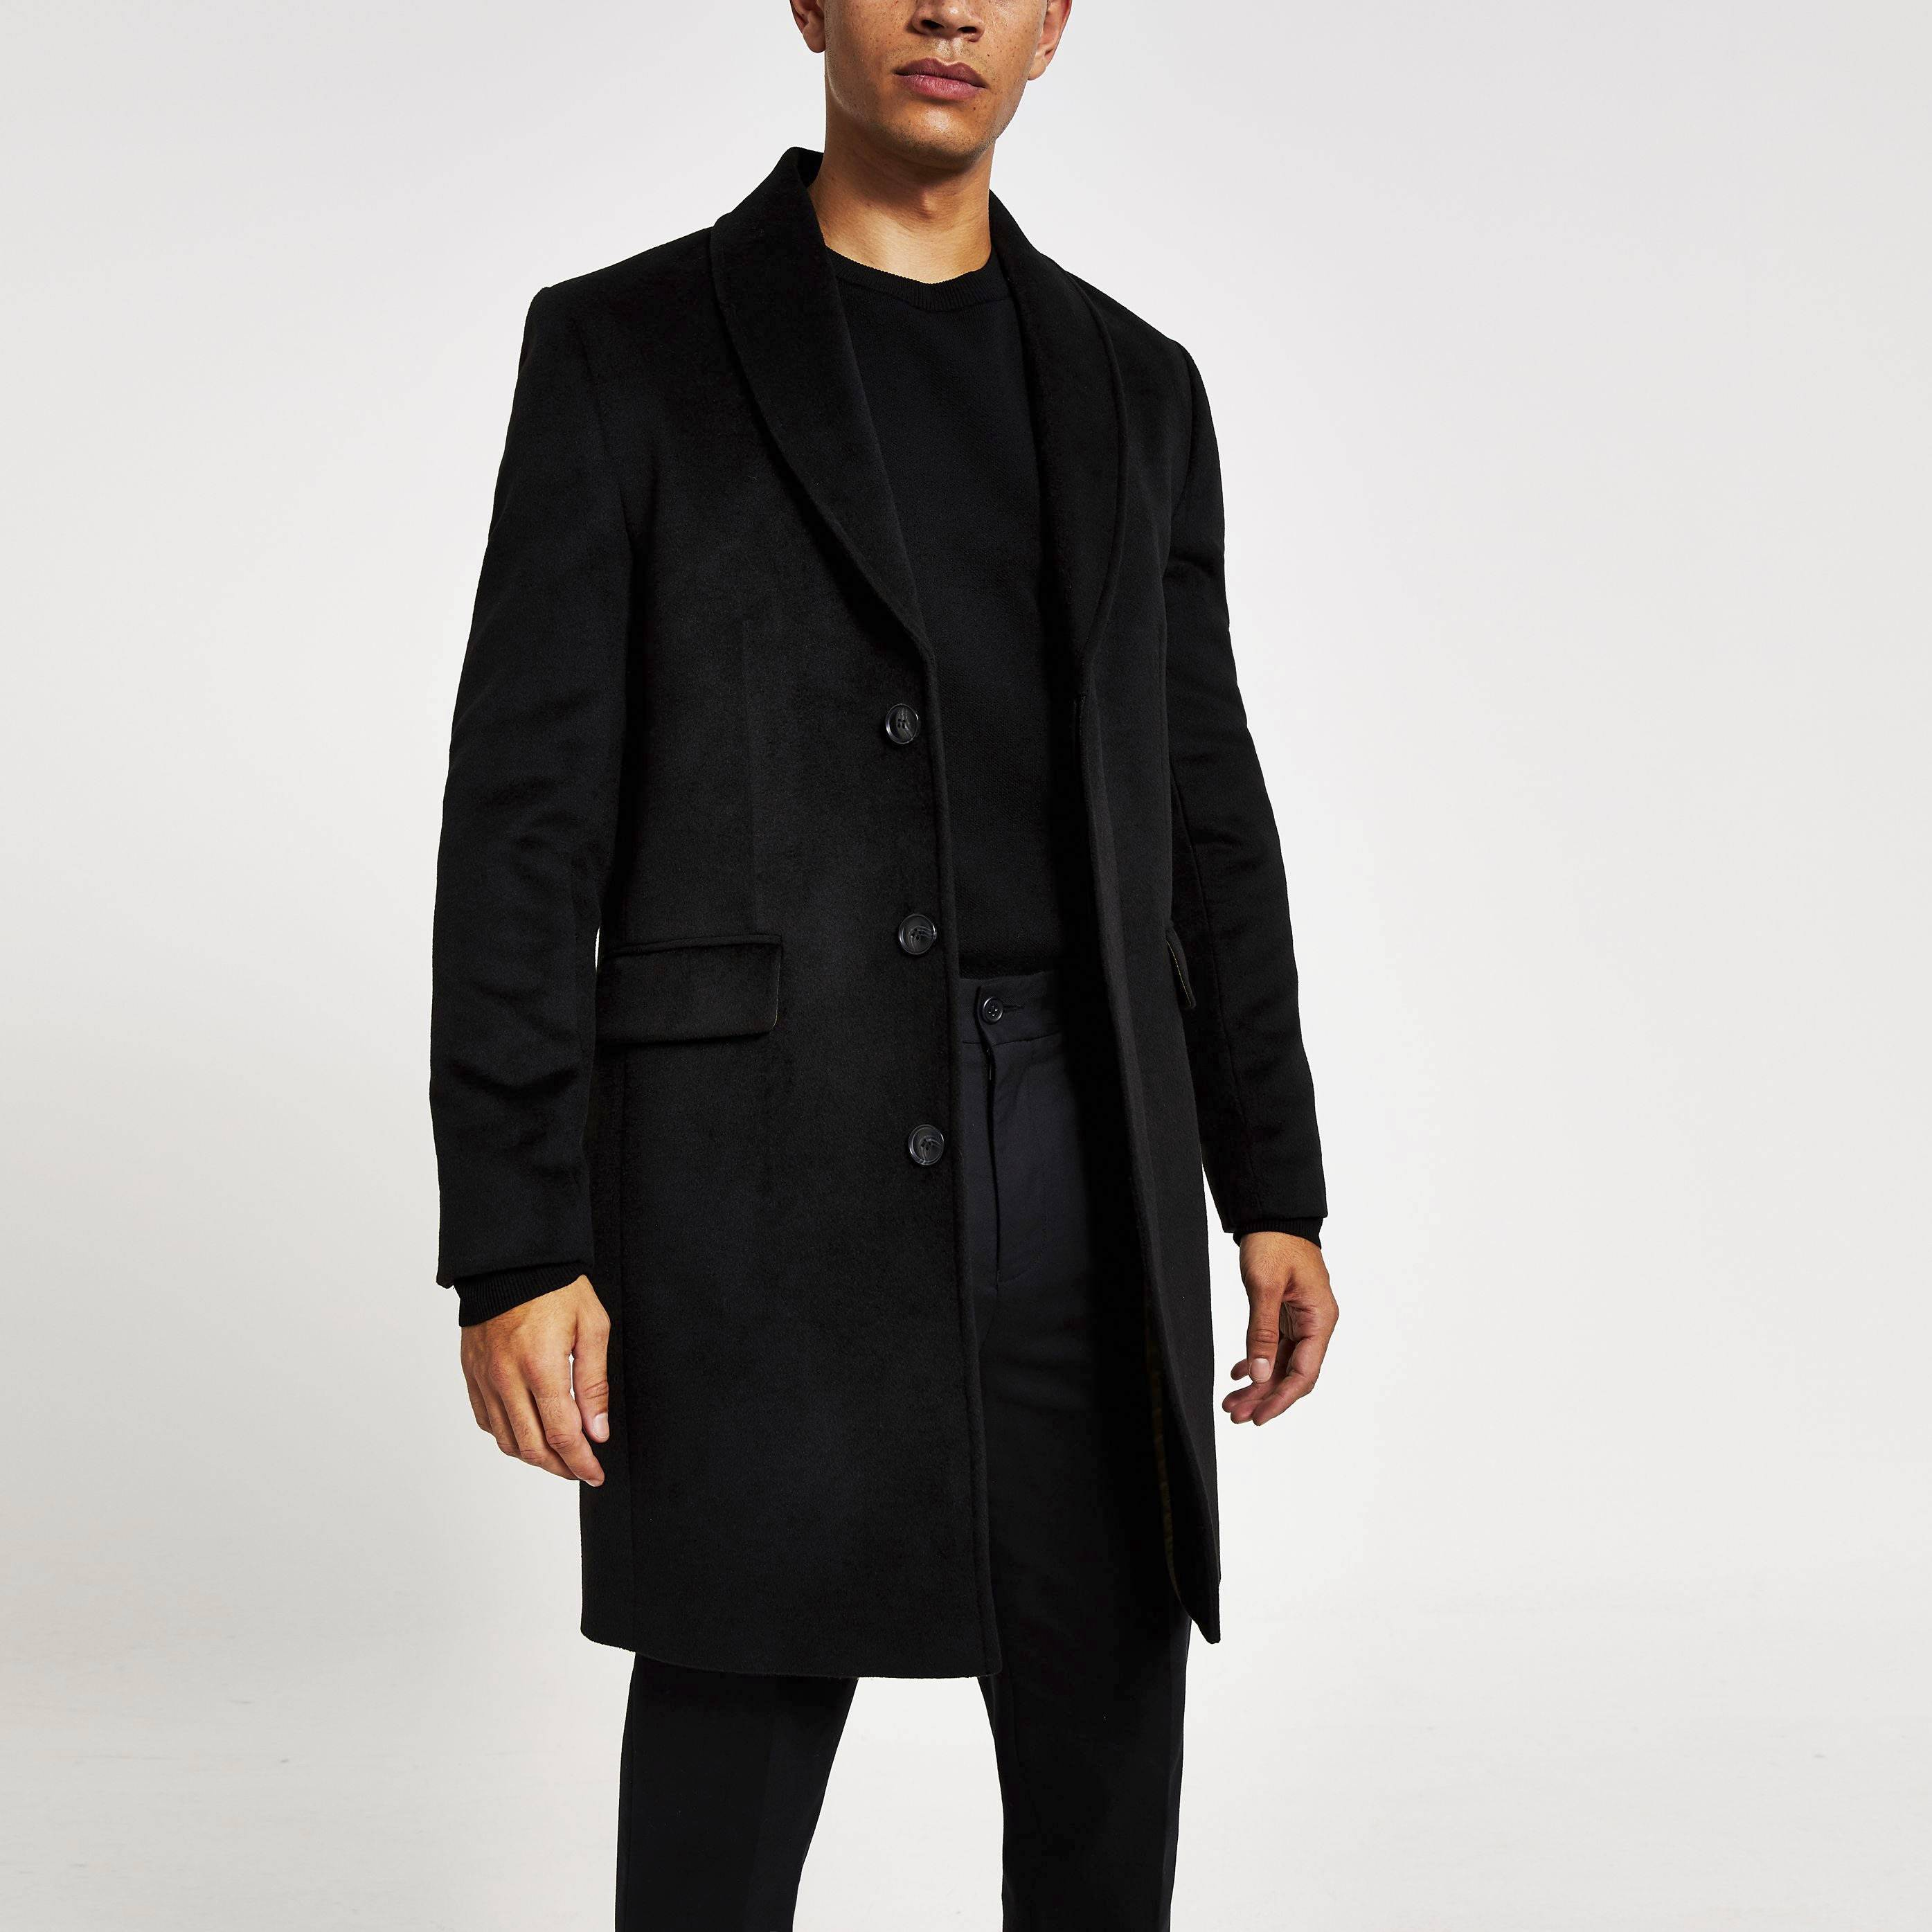 River Island Mens Black shawl collar overcoat (S)